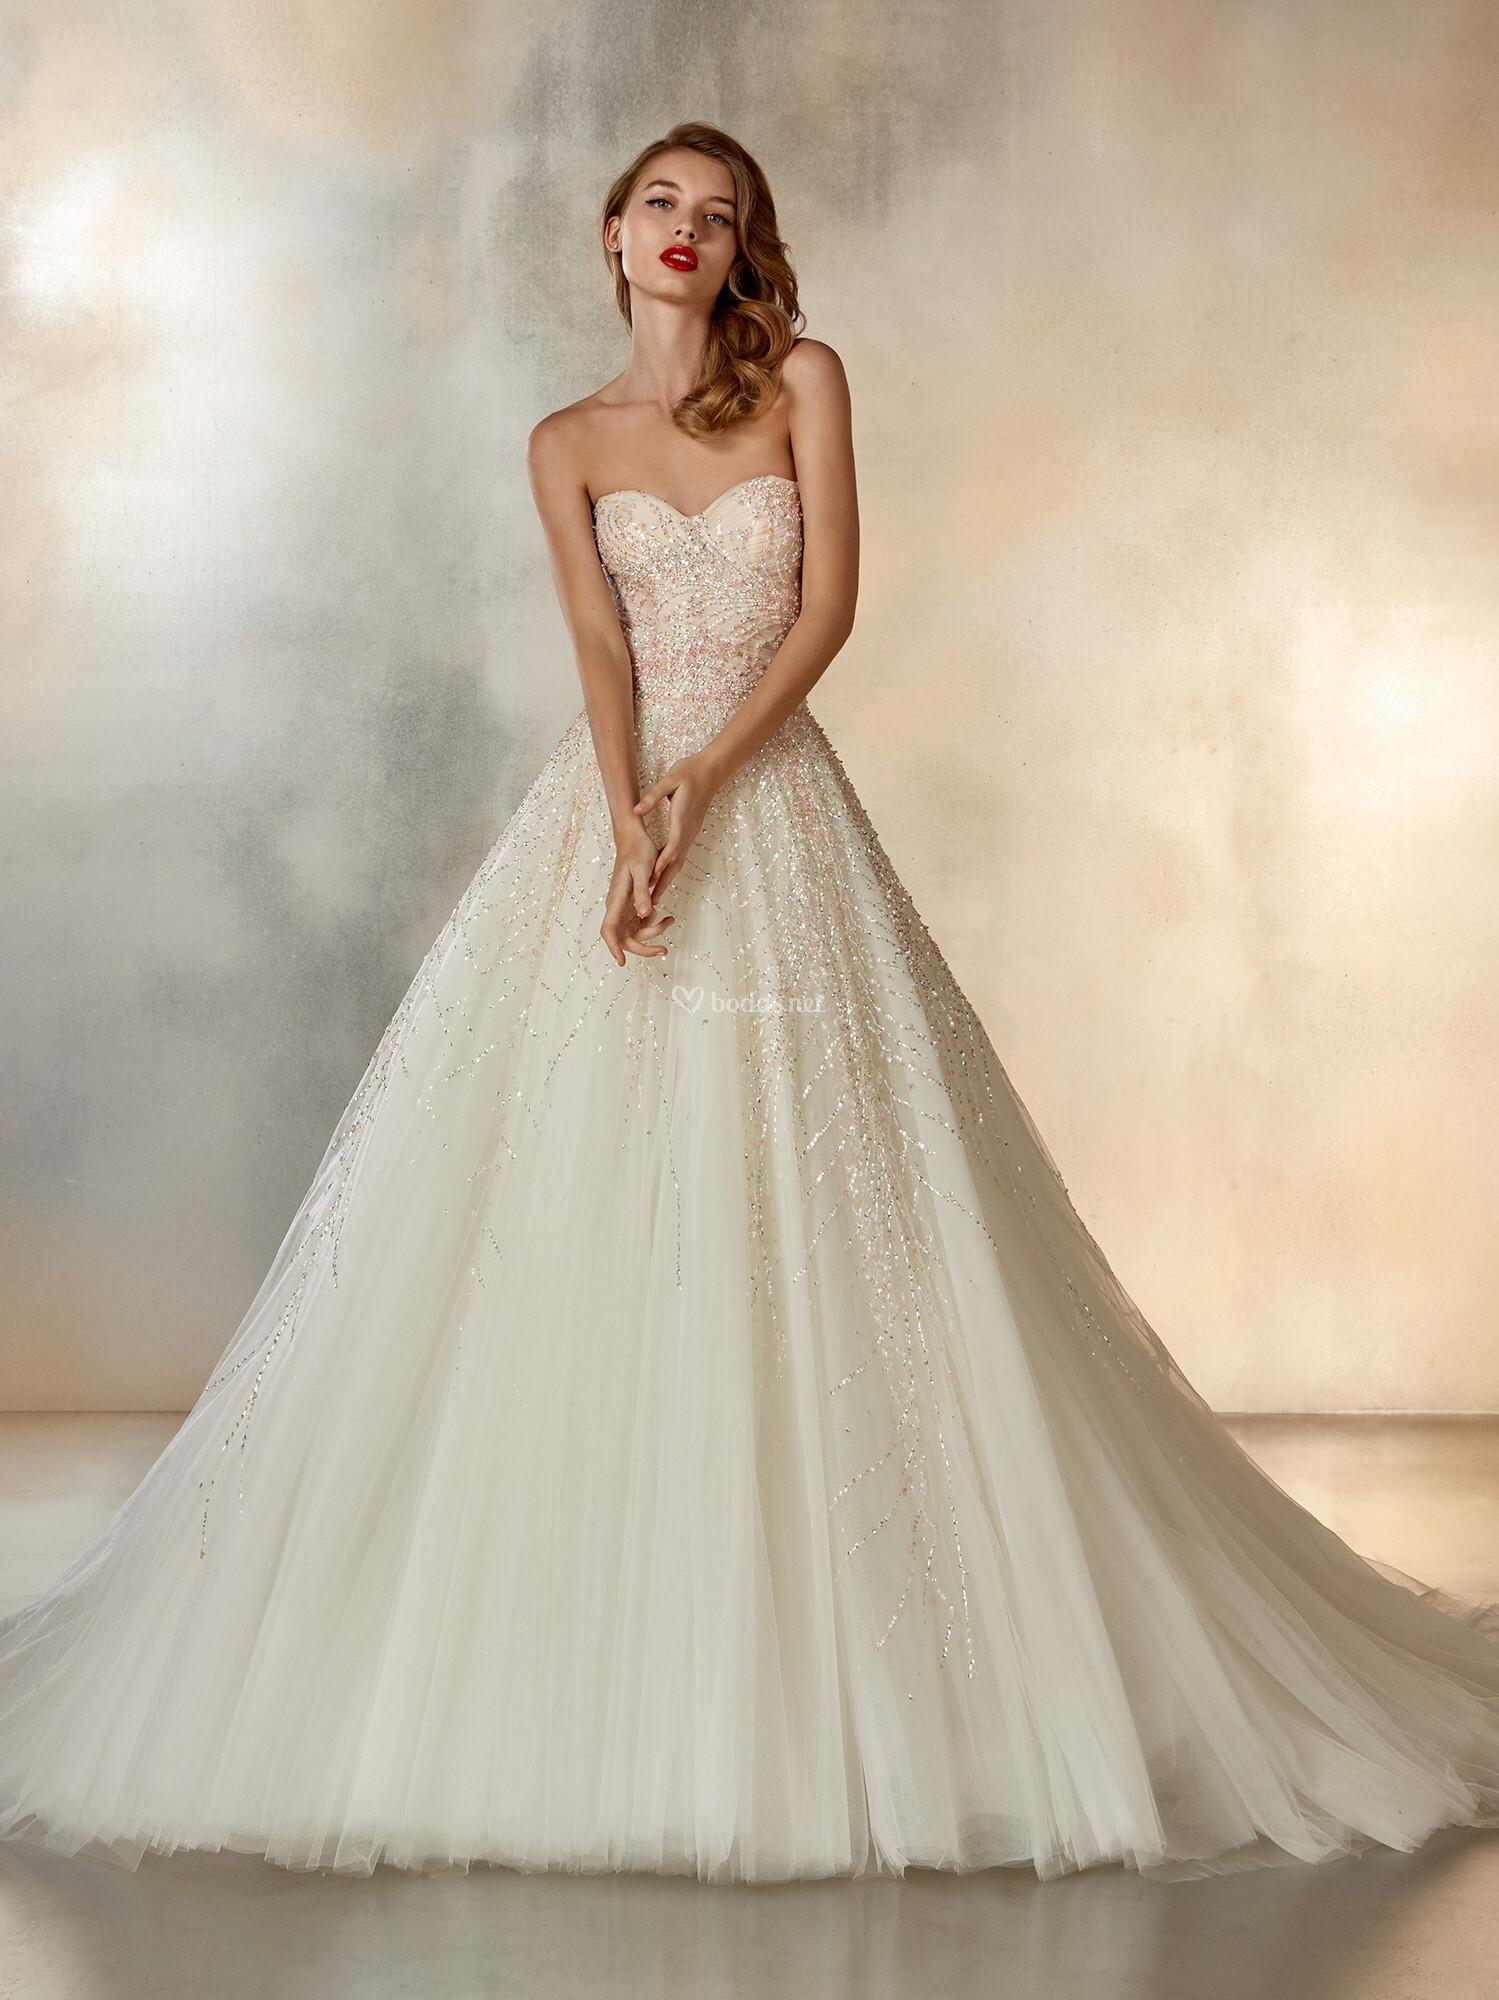 423aae12e Vestidos de Novia Corte Princesa - Bodas.net